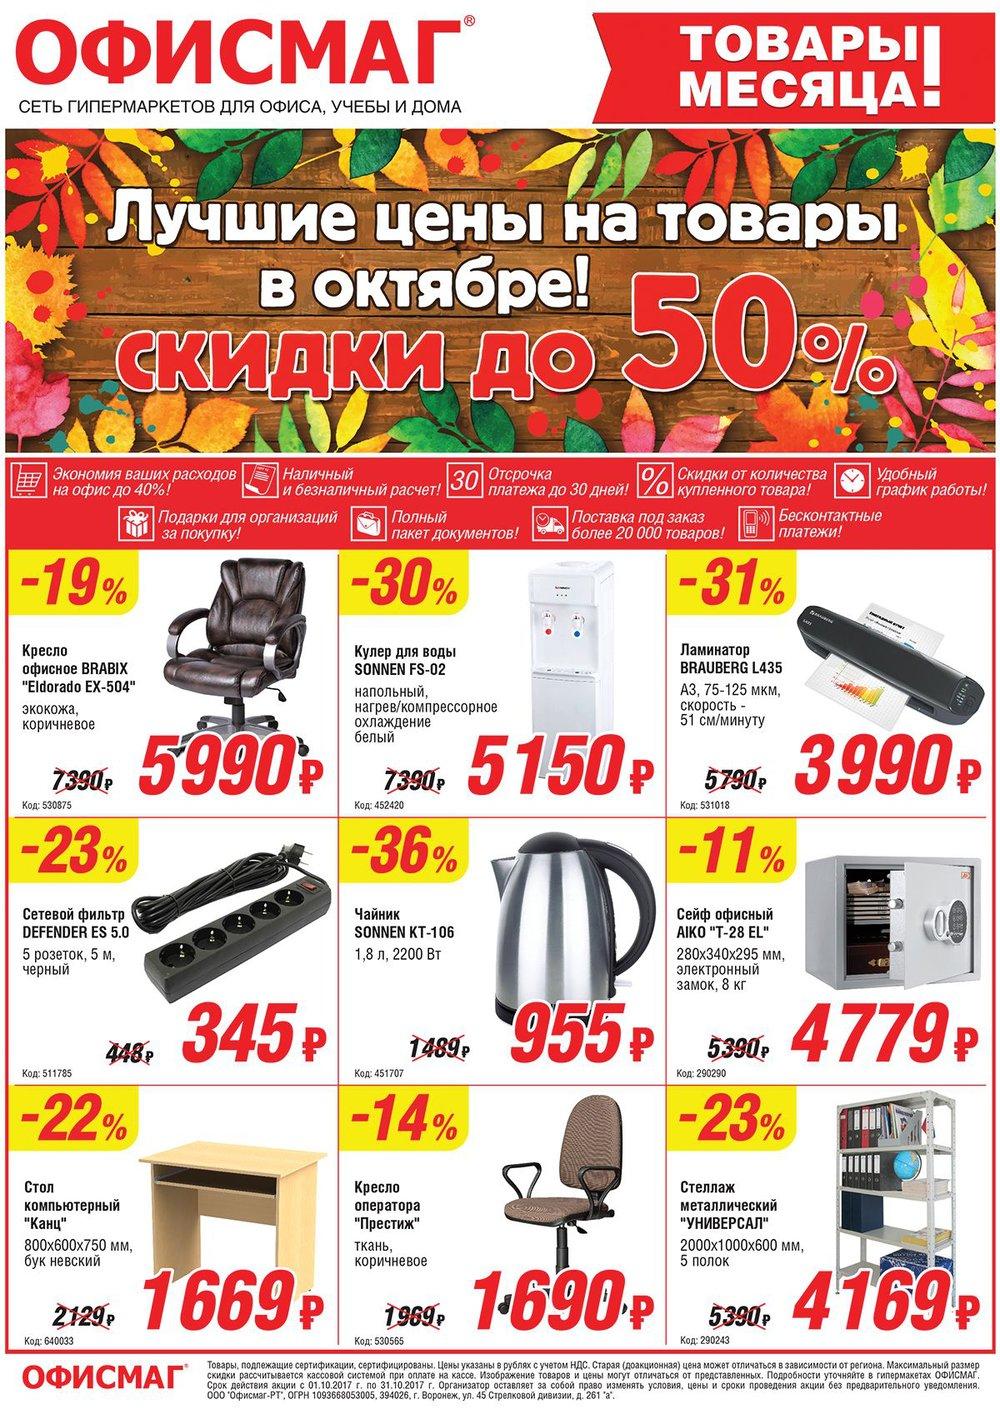 Каталог акций Офисмаг с 1 по 31 октября 2017 - стр. 1